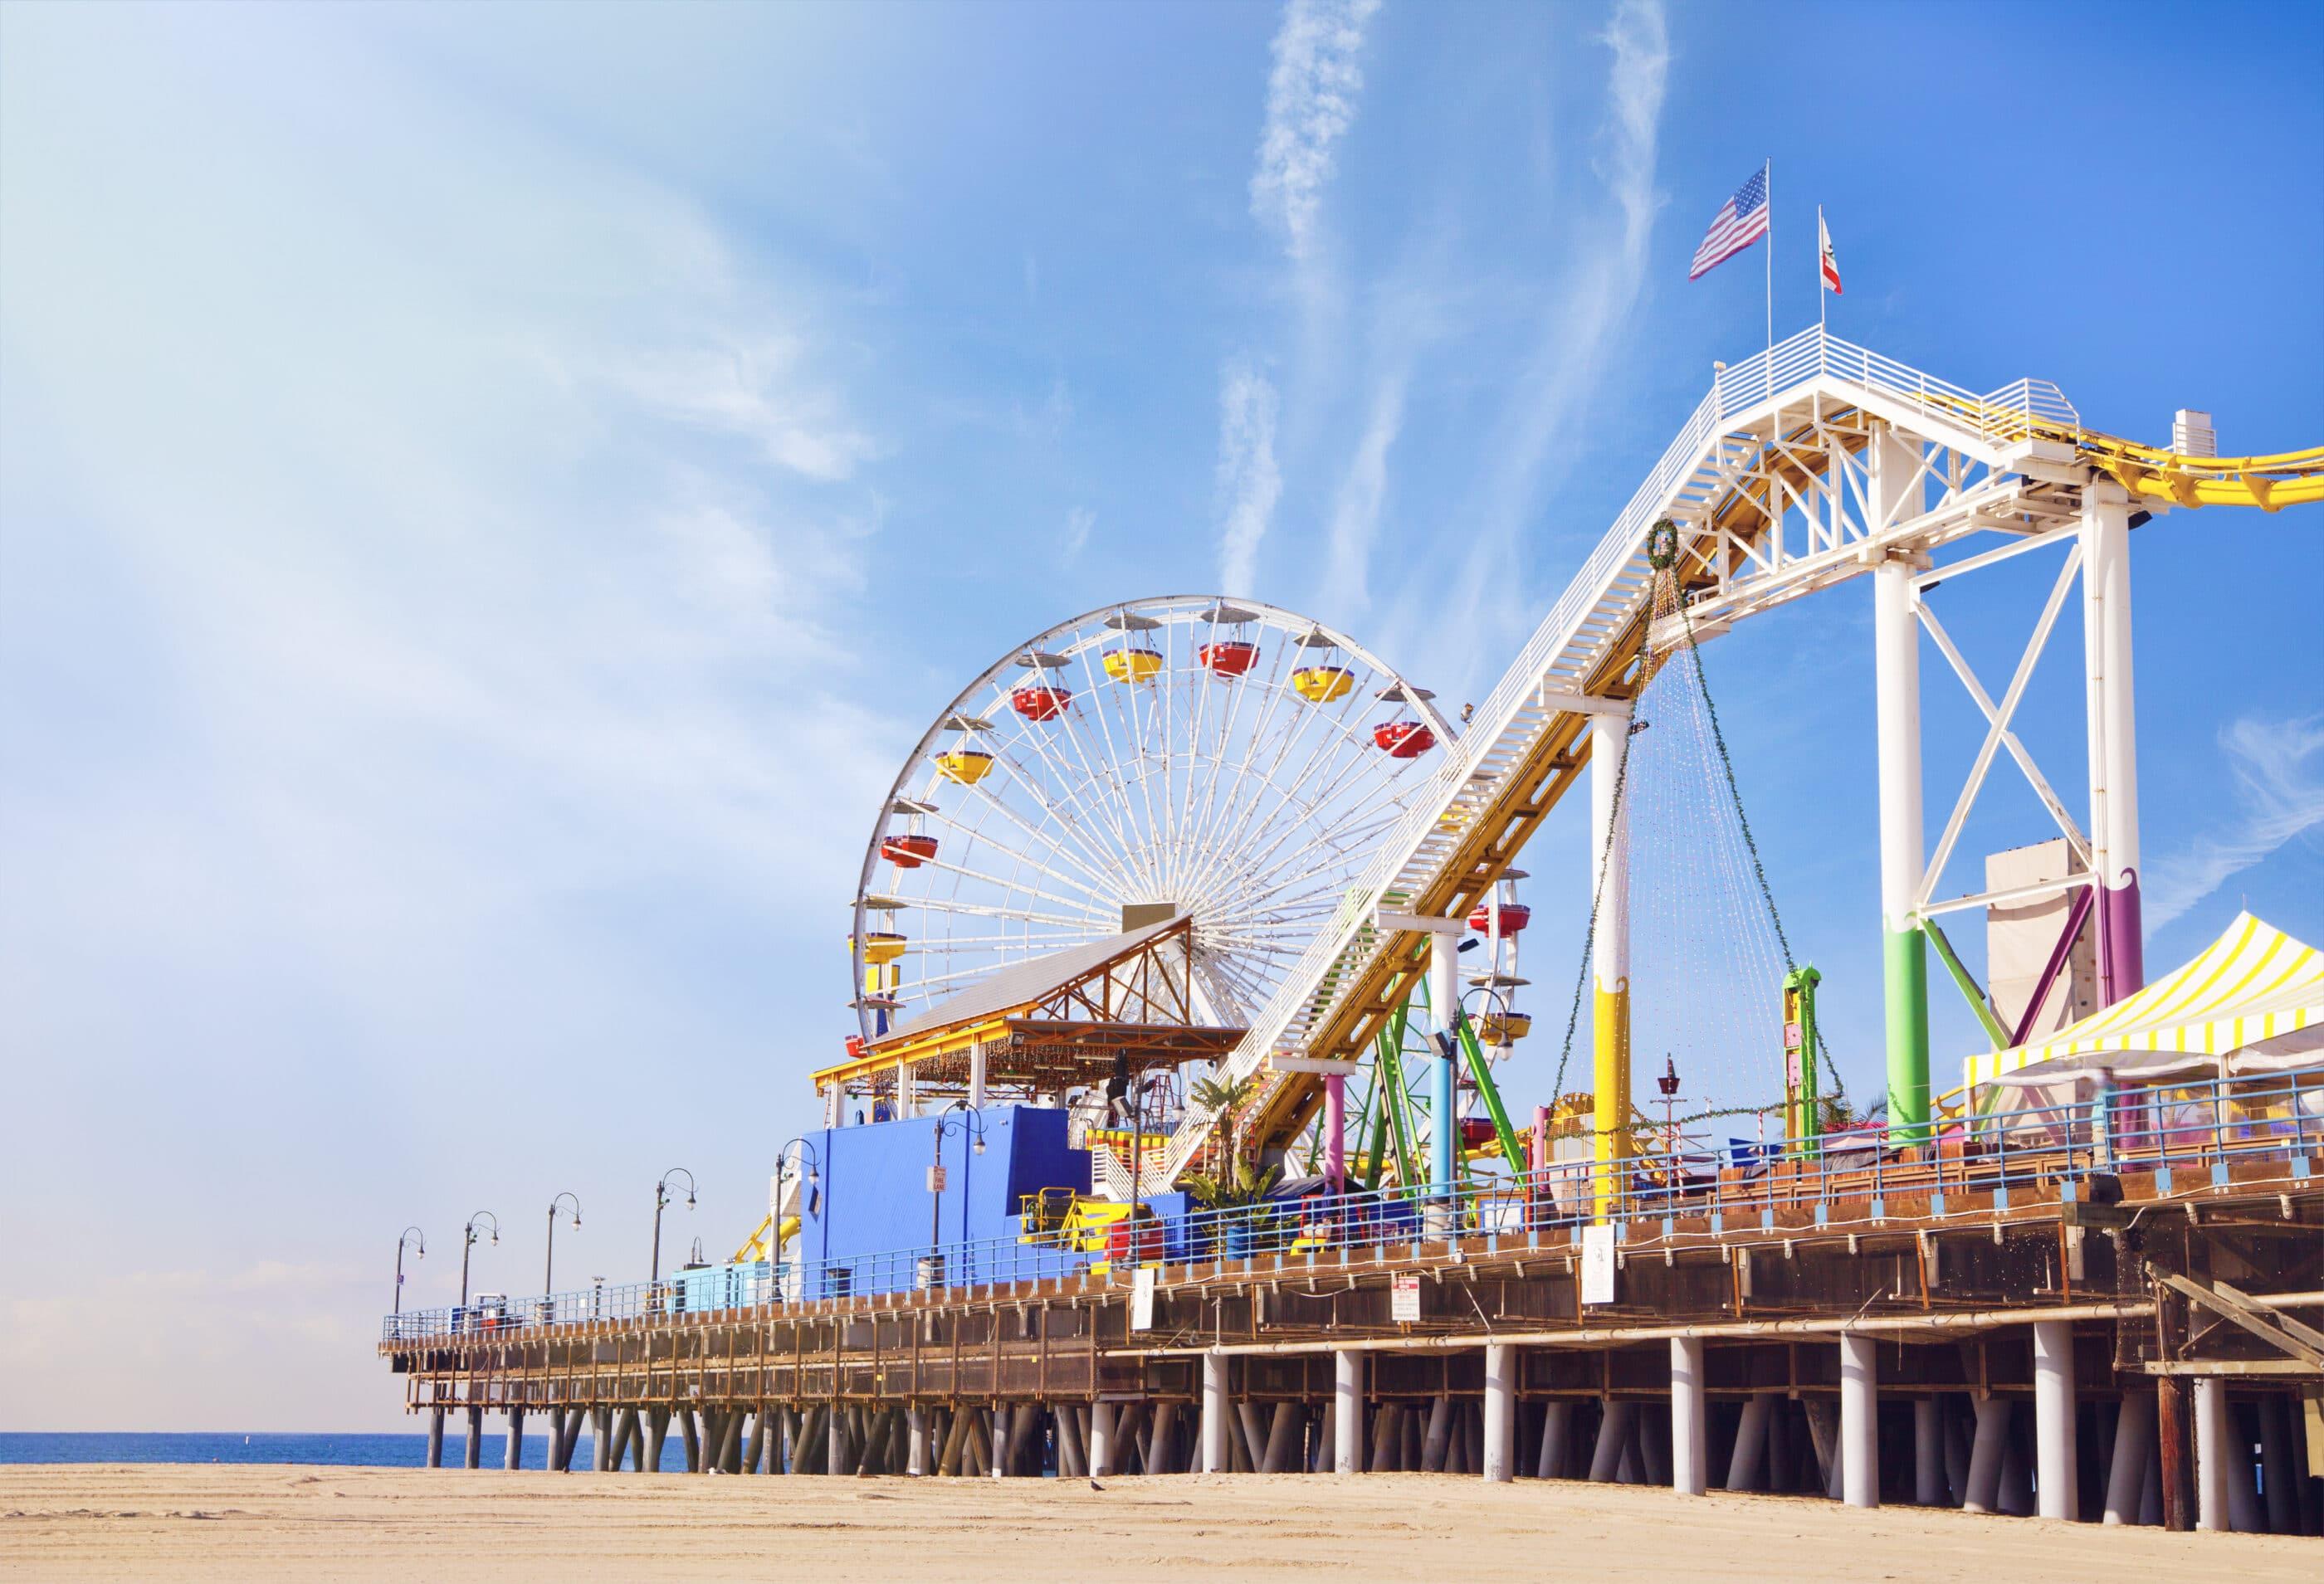 Ferris wheels and coaster on Santa Monica pier.